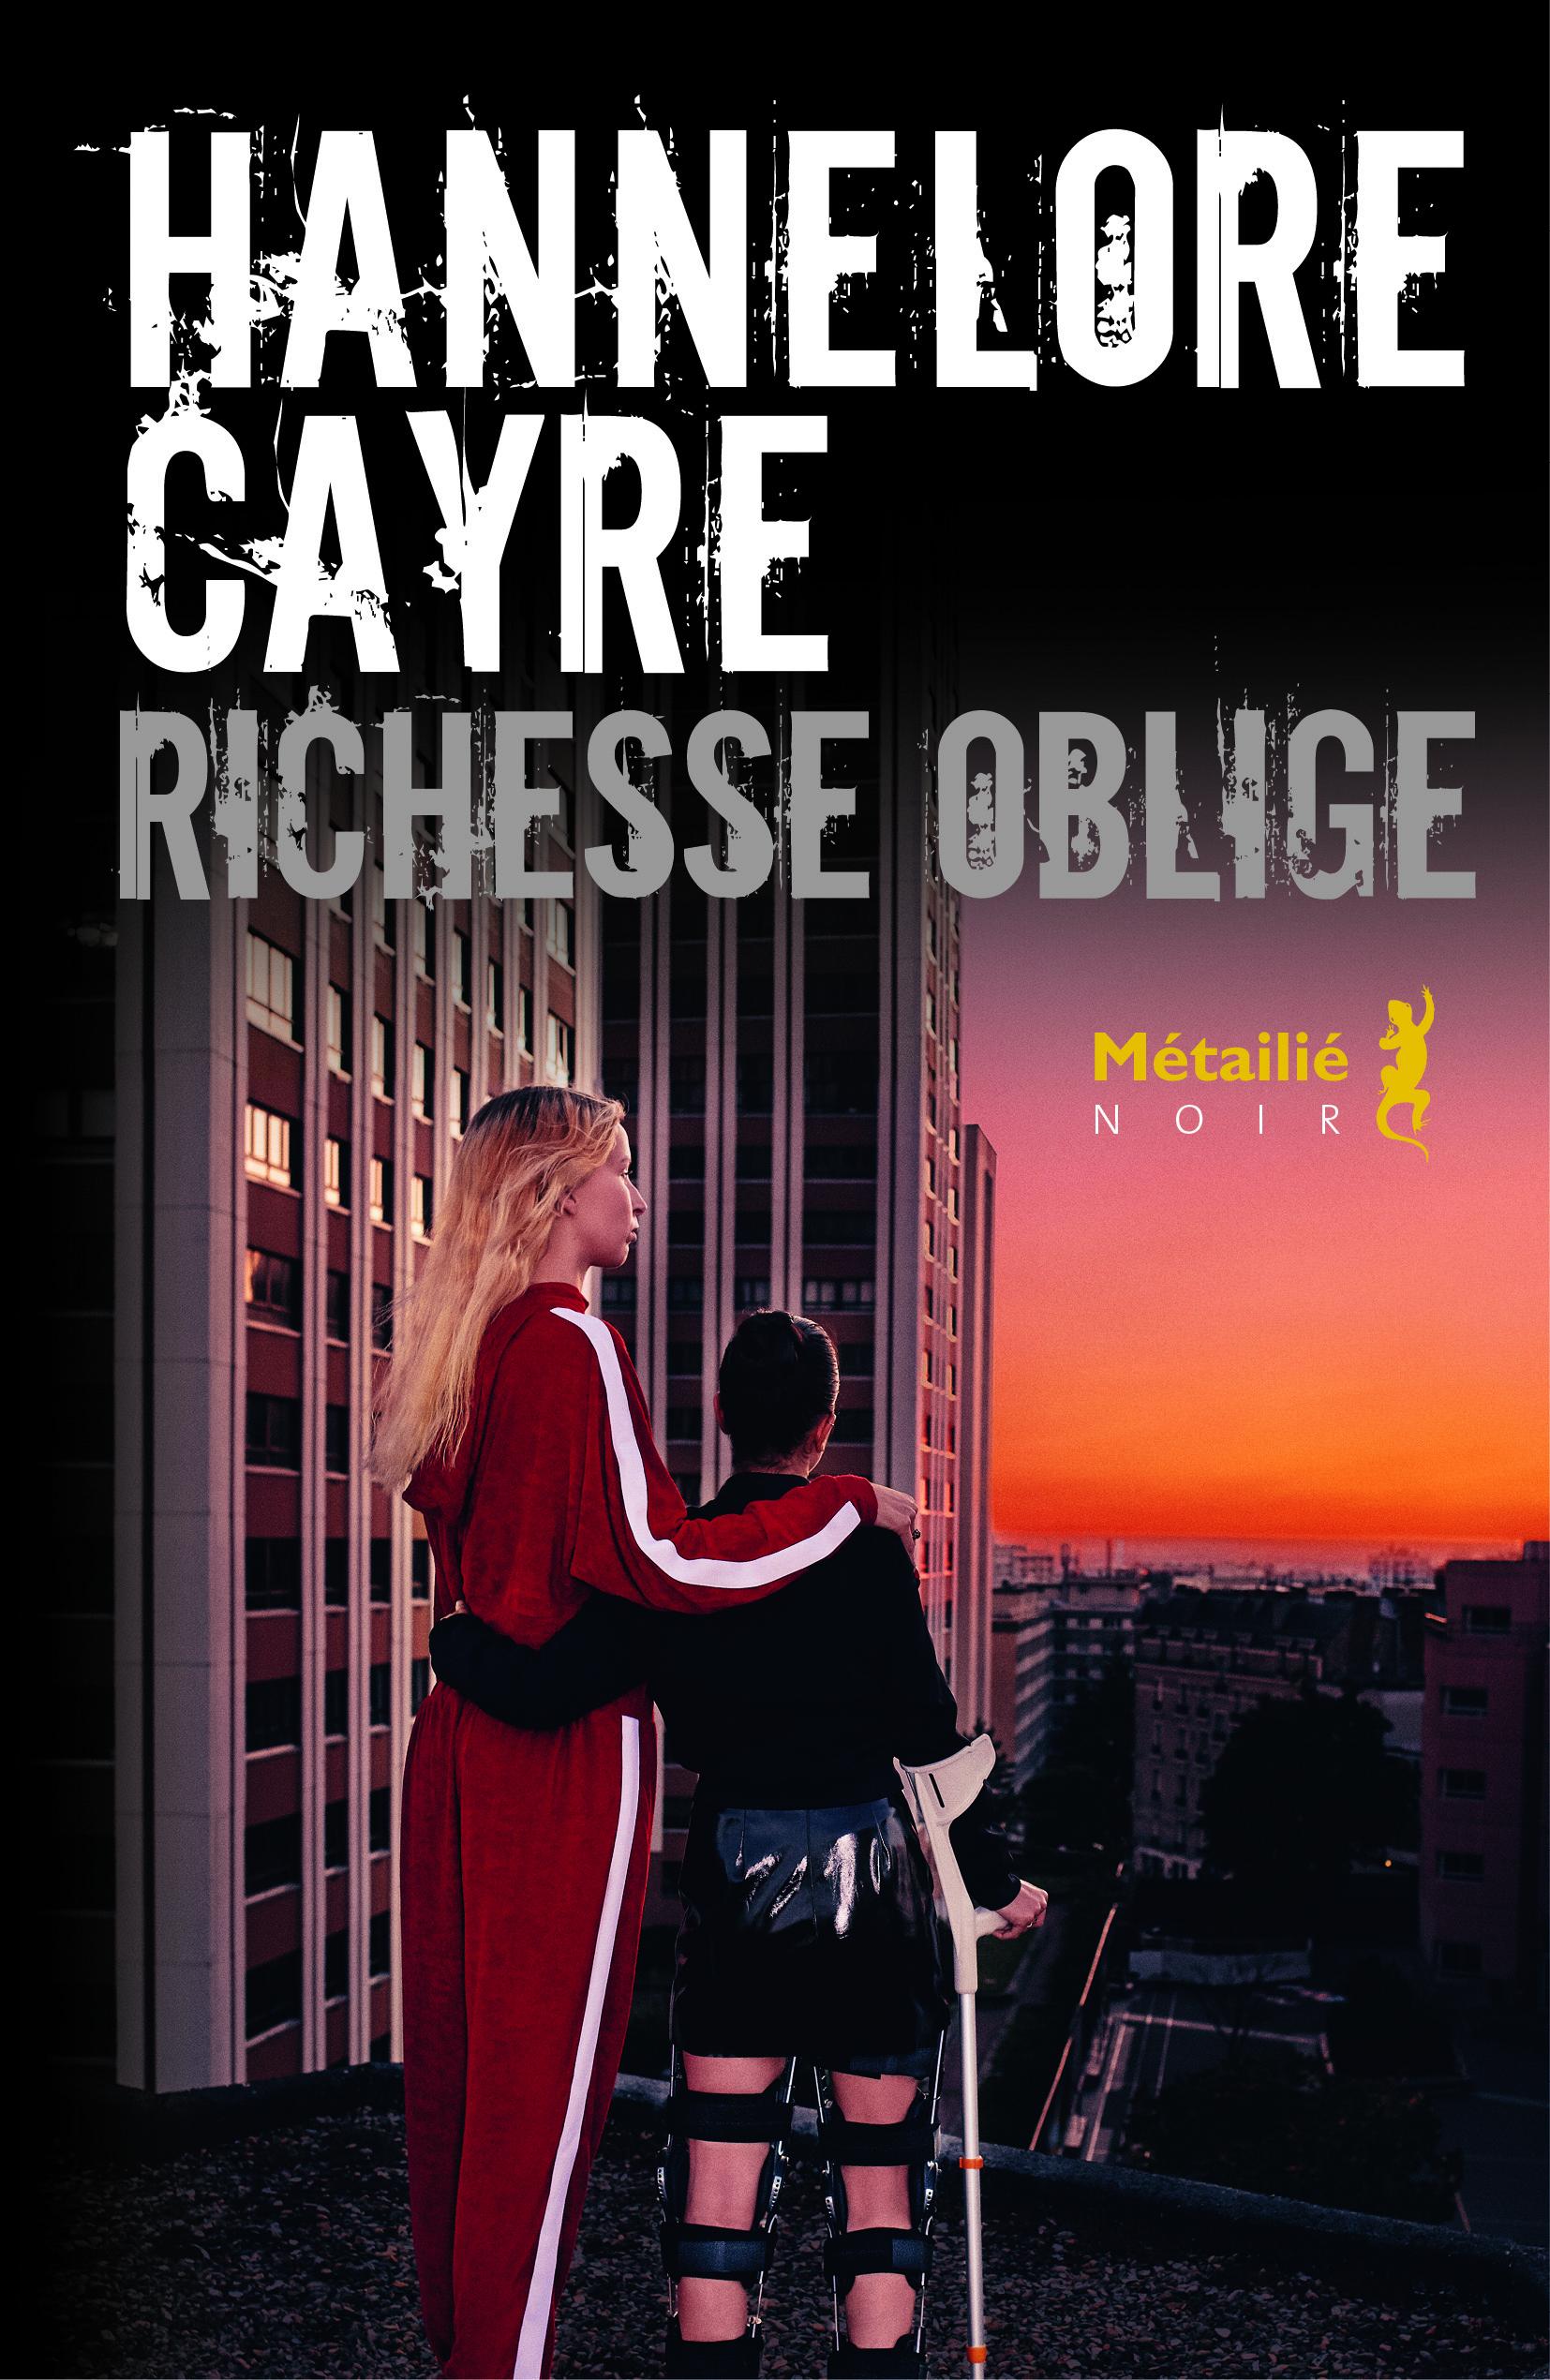 RICHESSE OBLIGE – Bande Annonce Culture